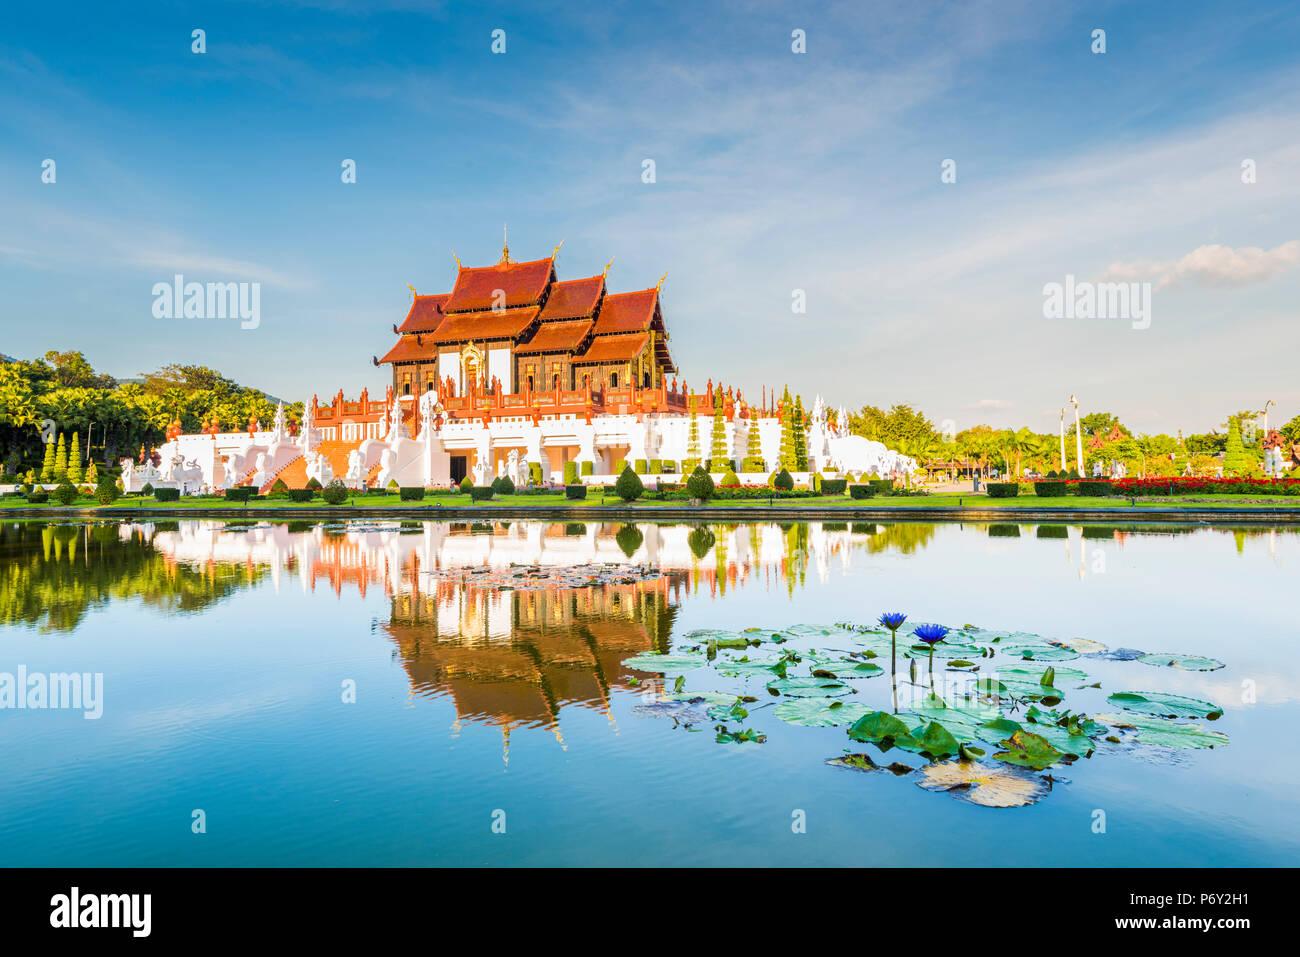 Royal Park Rajapruek, Chiang Mai, Thailandia. Royal Pavilion al tramonto. Foto Stock